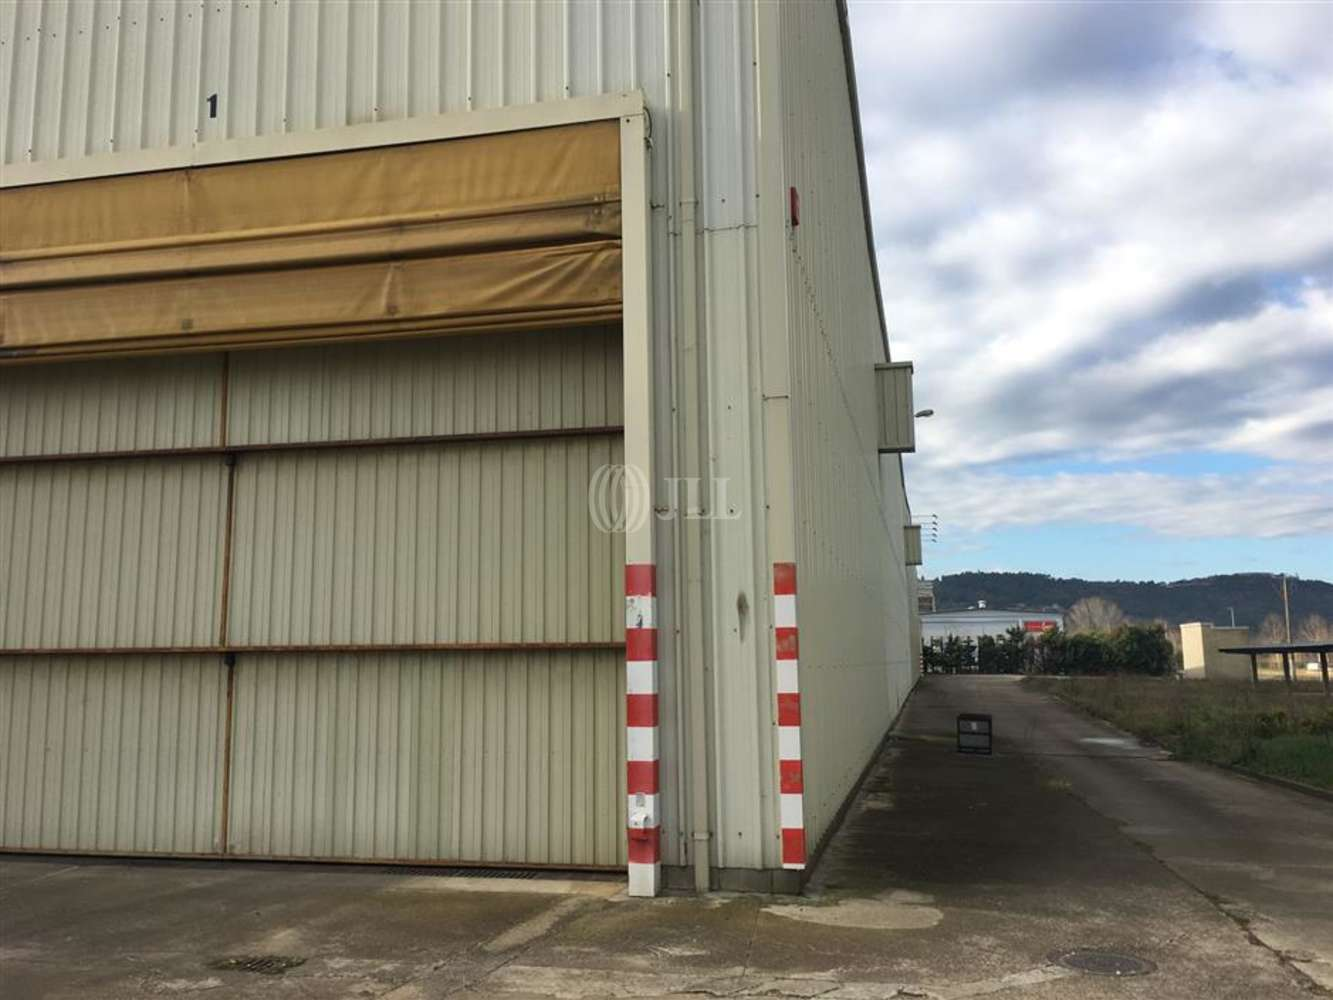 Naves industriales y logísticas Celrà, 17460 - Nave Industrial - B0455 - P.I CELRÀ